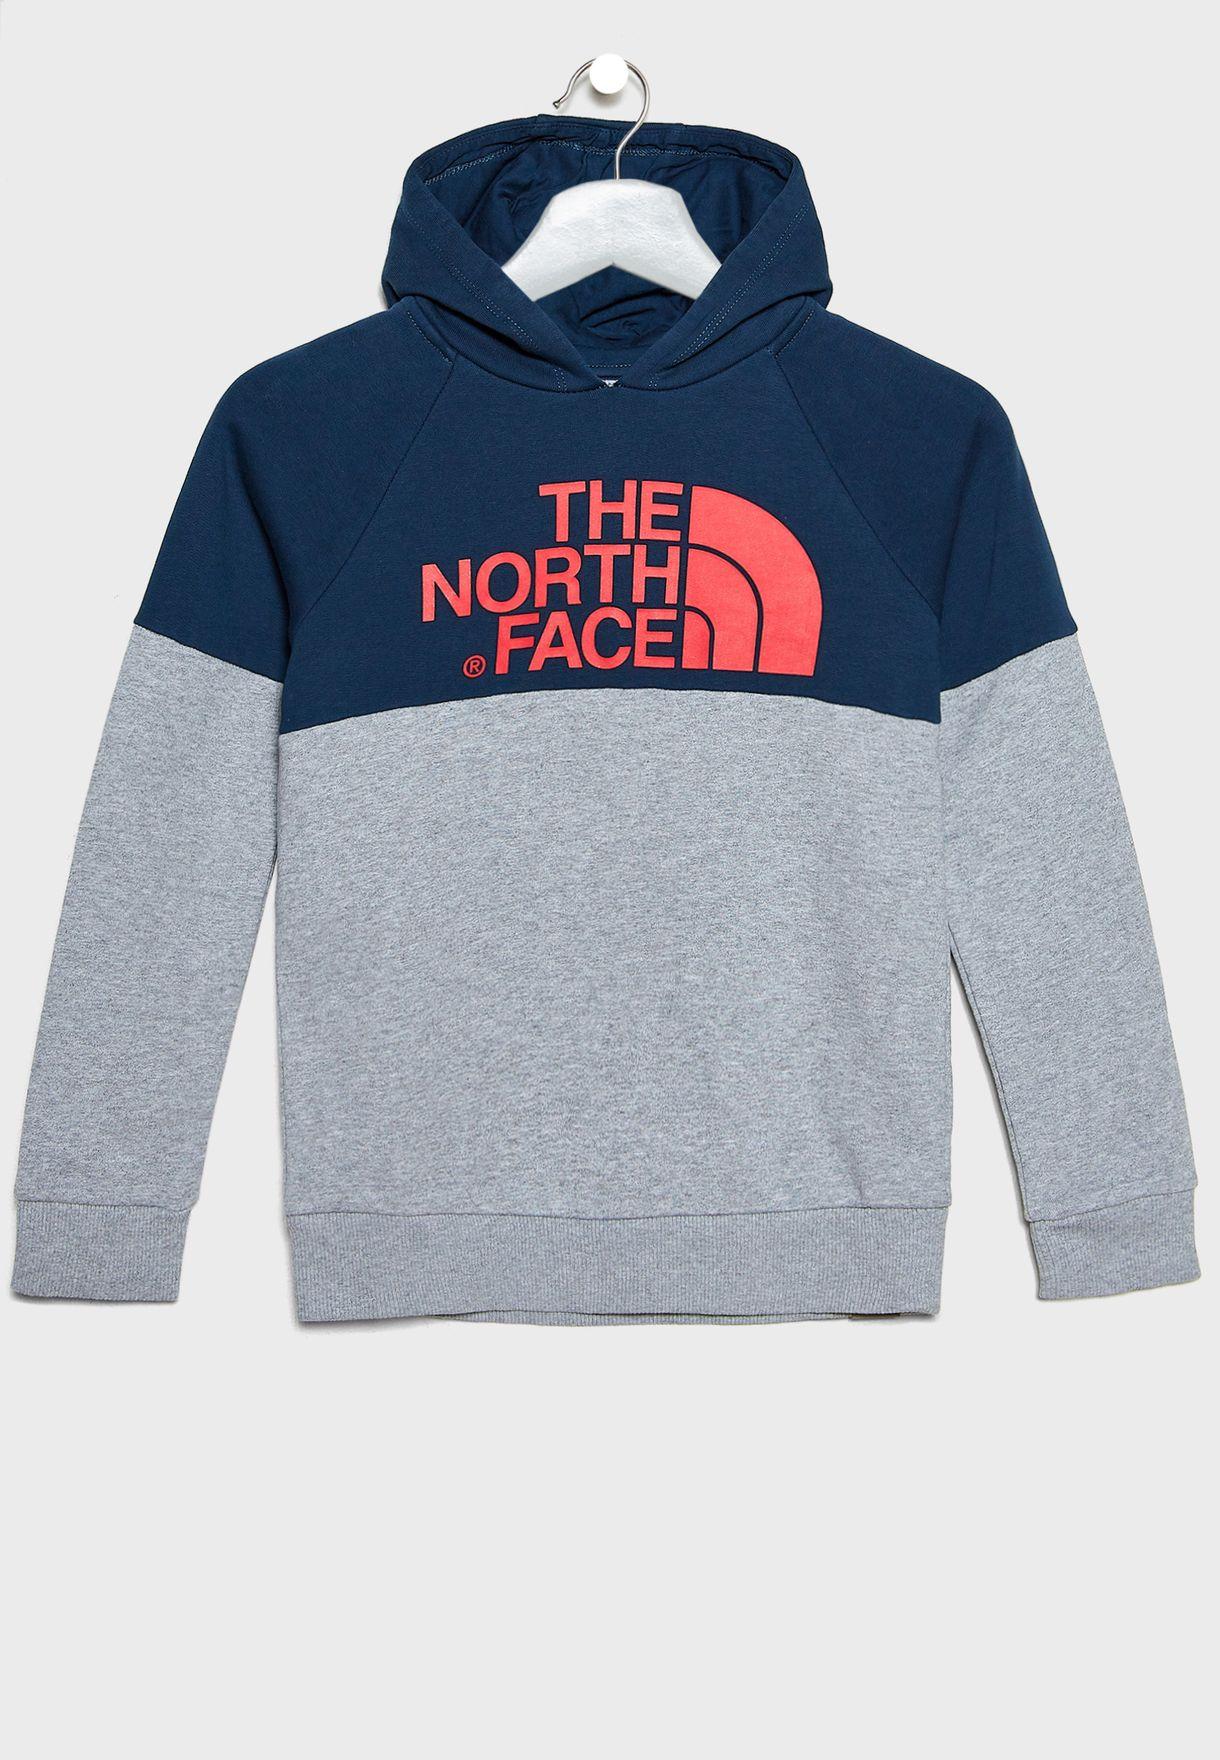 6cfe0c8023b4 Shop The North Face multicolor Youth Drew Peak Raglan Hoodie T93L6K ...